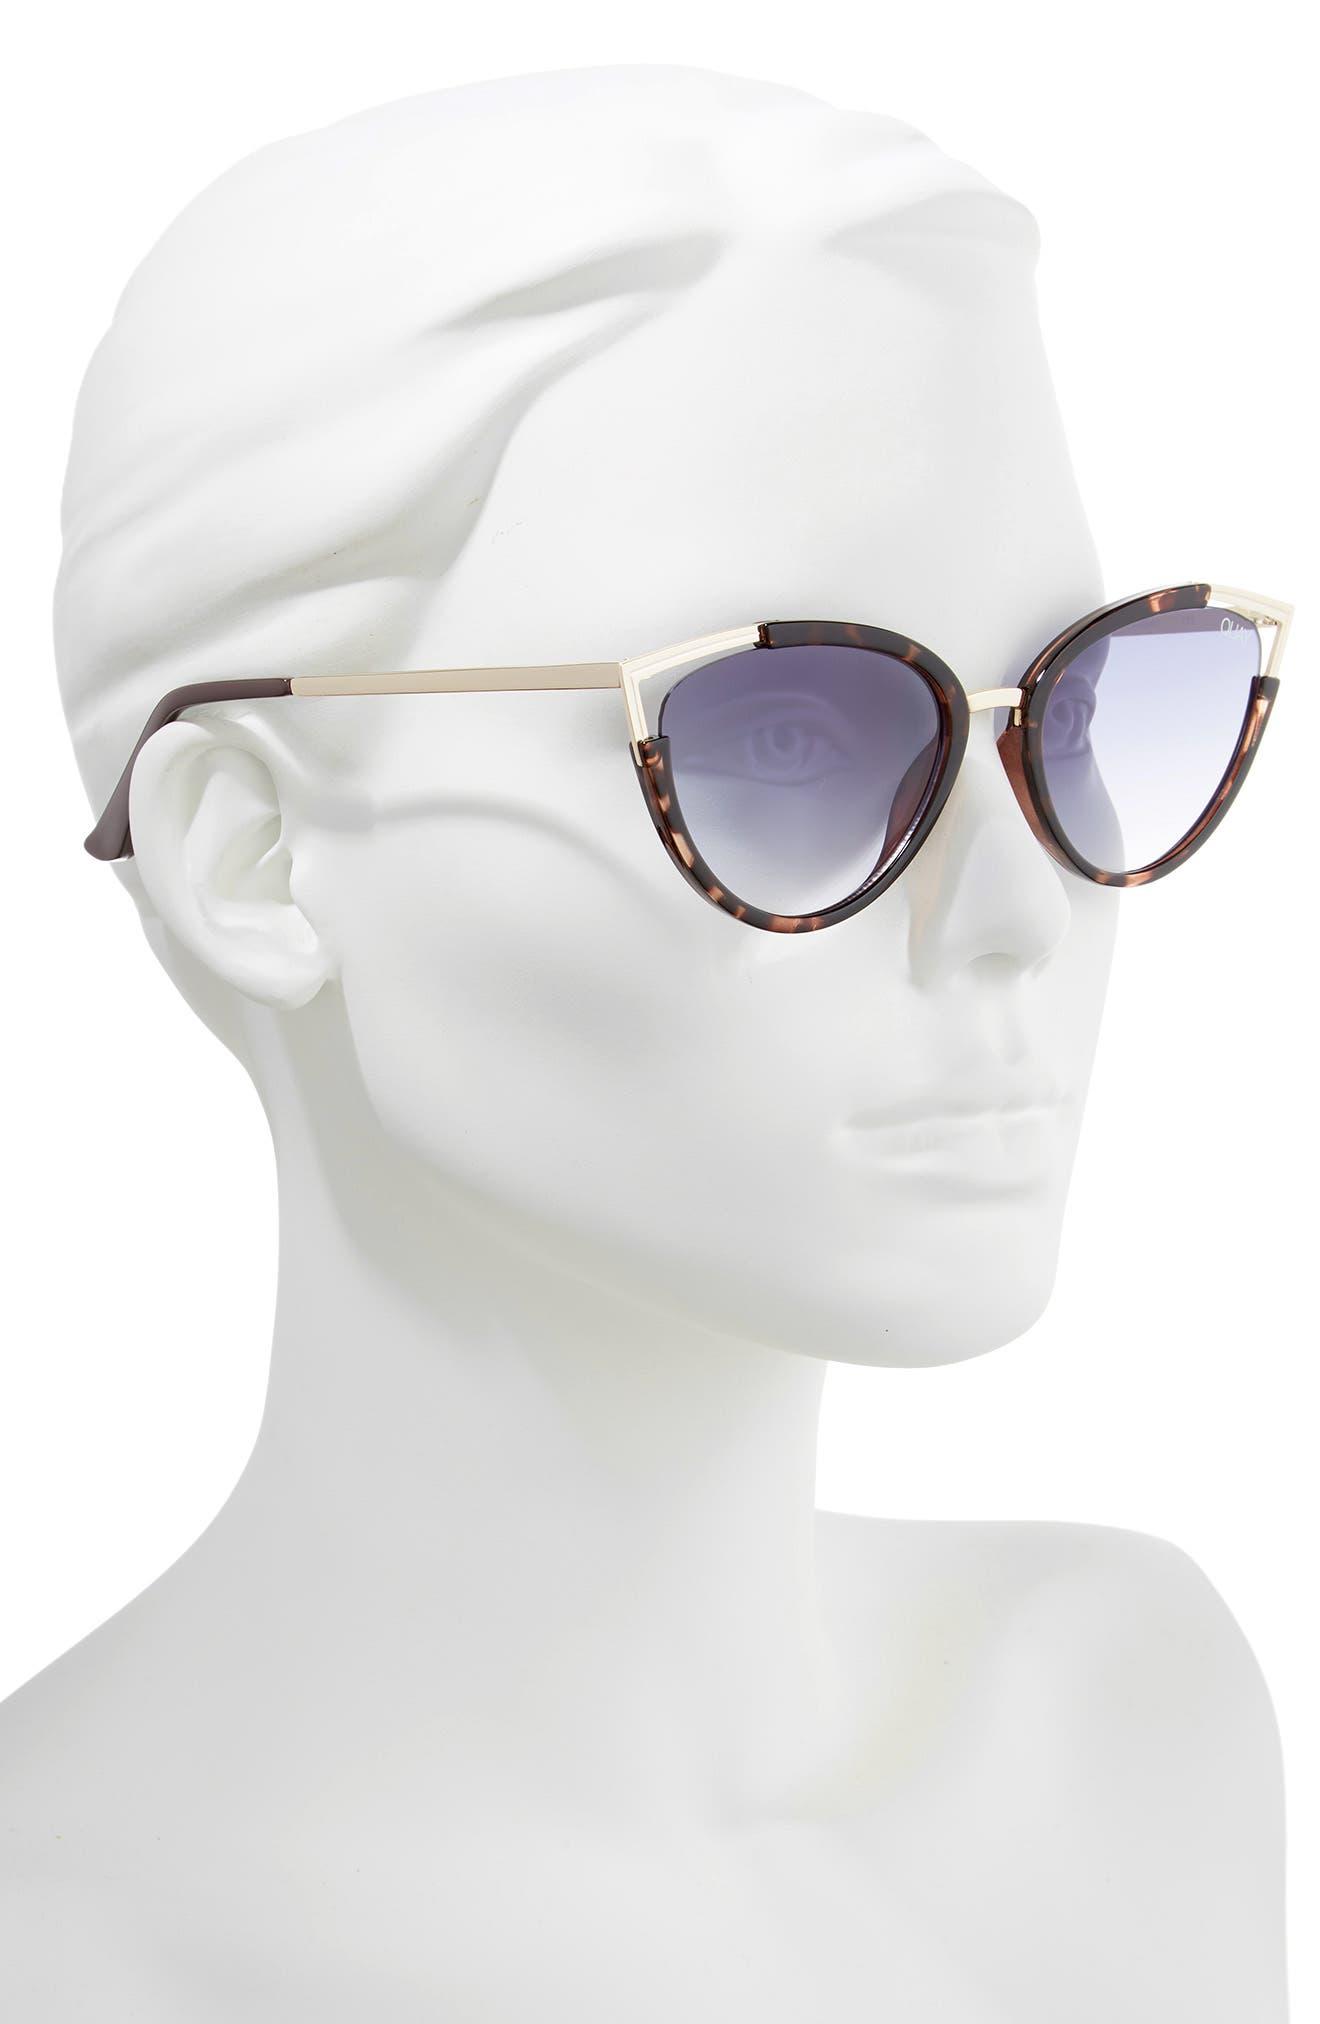 Hearsay 65mm Cat Eye Sunglasses,                             Alternate thumbnail 2, color,                             TORT/ NAVY